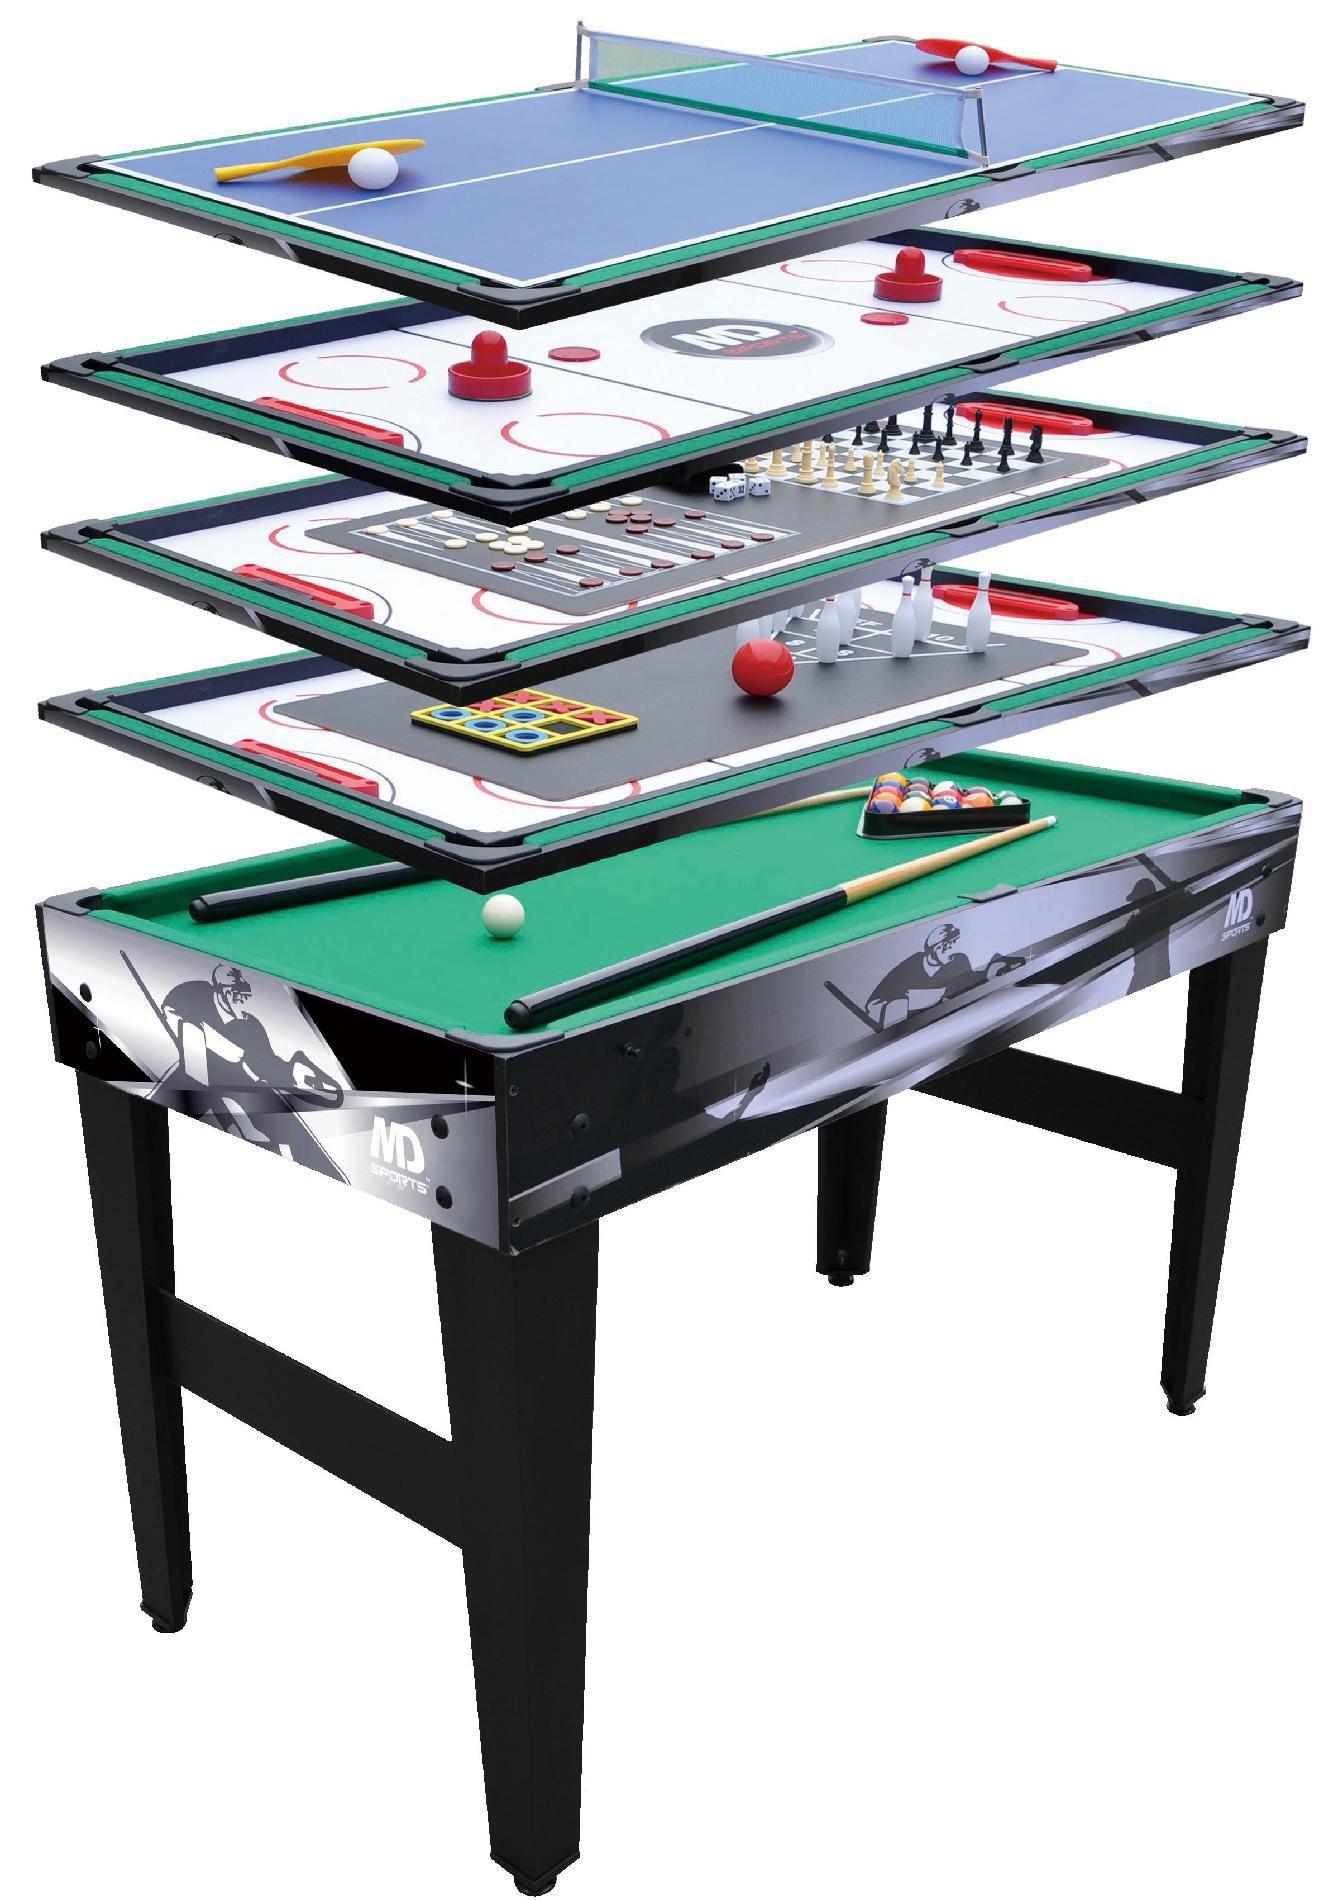 5434e0e4646 MD Sports 48in 12-in-1 Multi Game Table -  89.99! - http